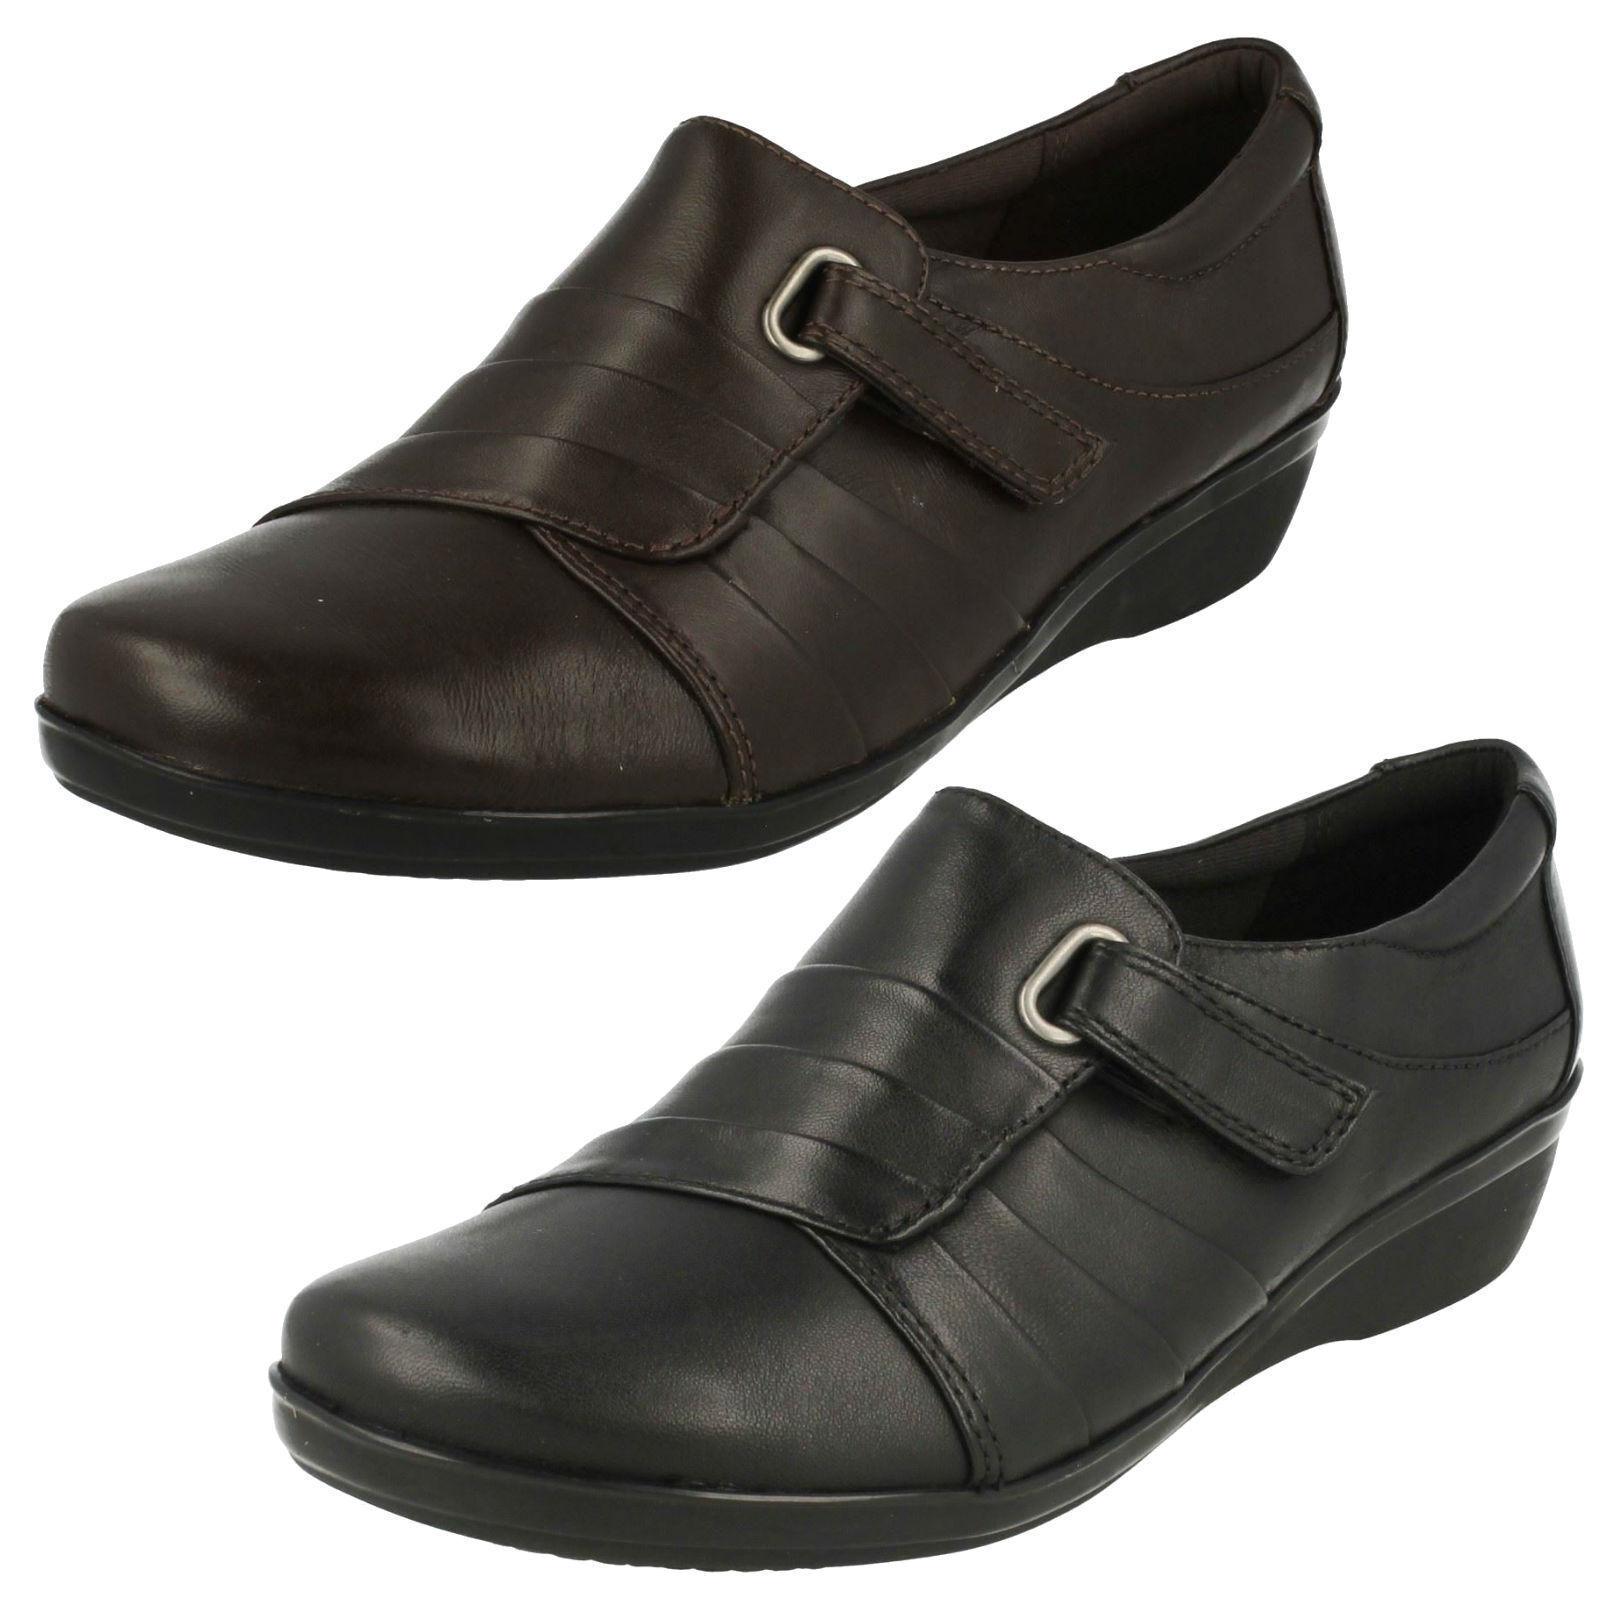 Damen Clarks schwarz / dunkelbraune Leder Schuhe everlay Luna